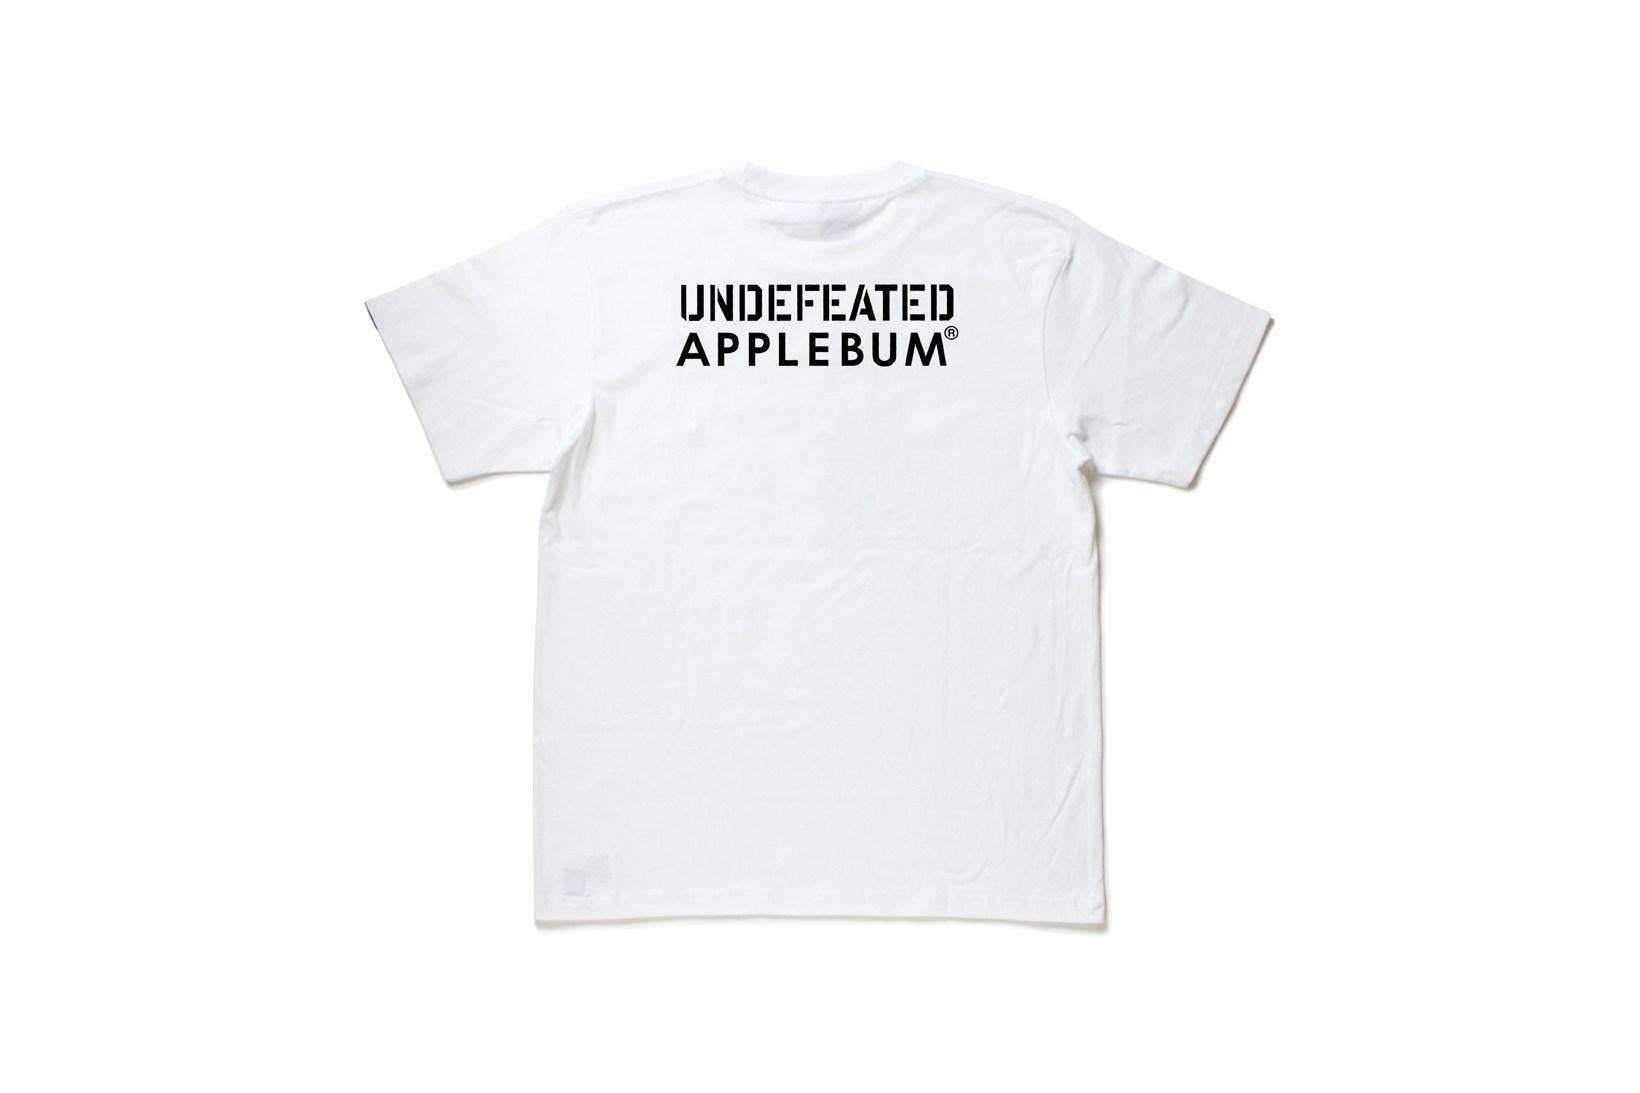 undefeated-applebum-2016-2